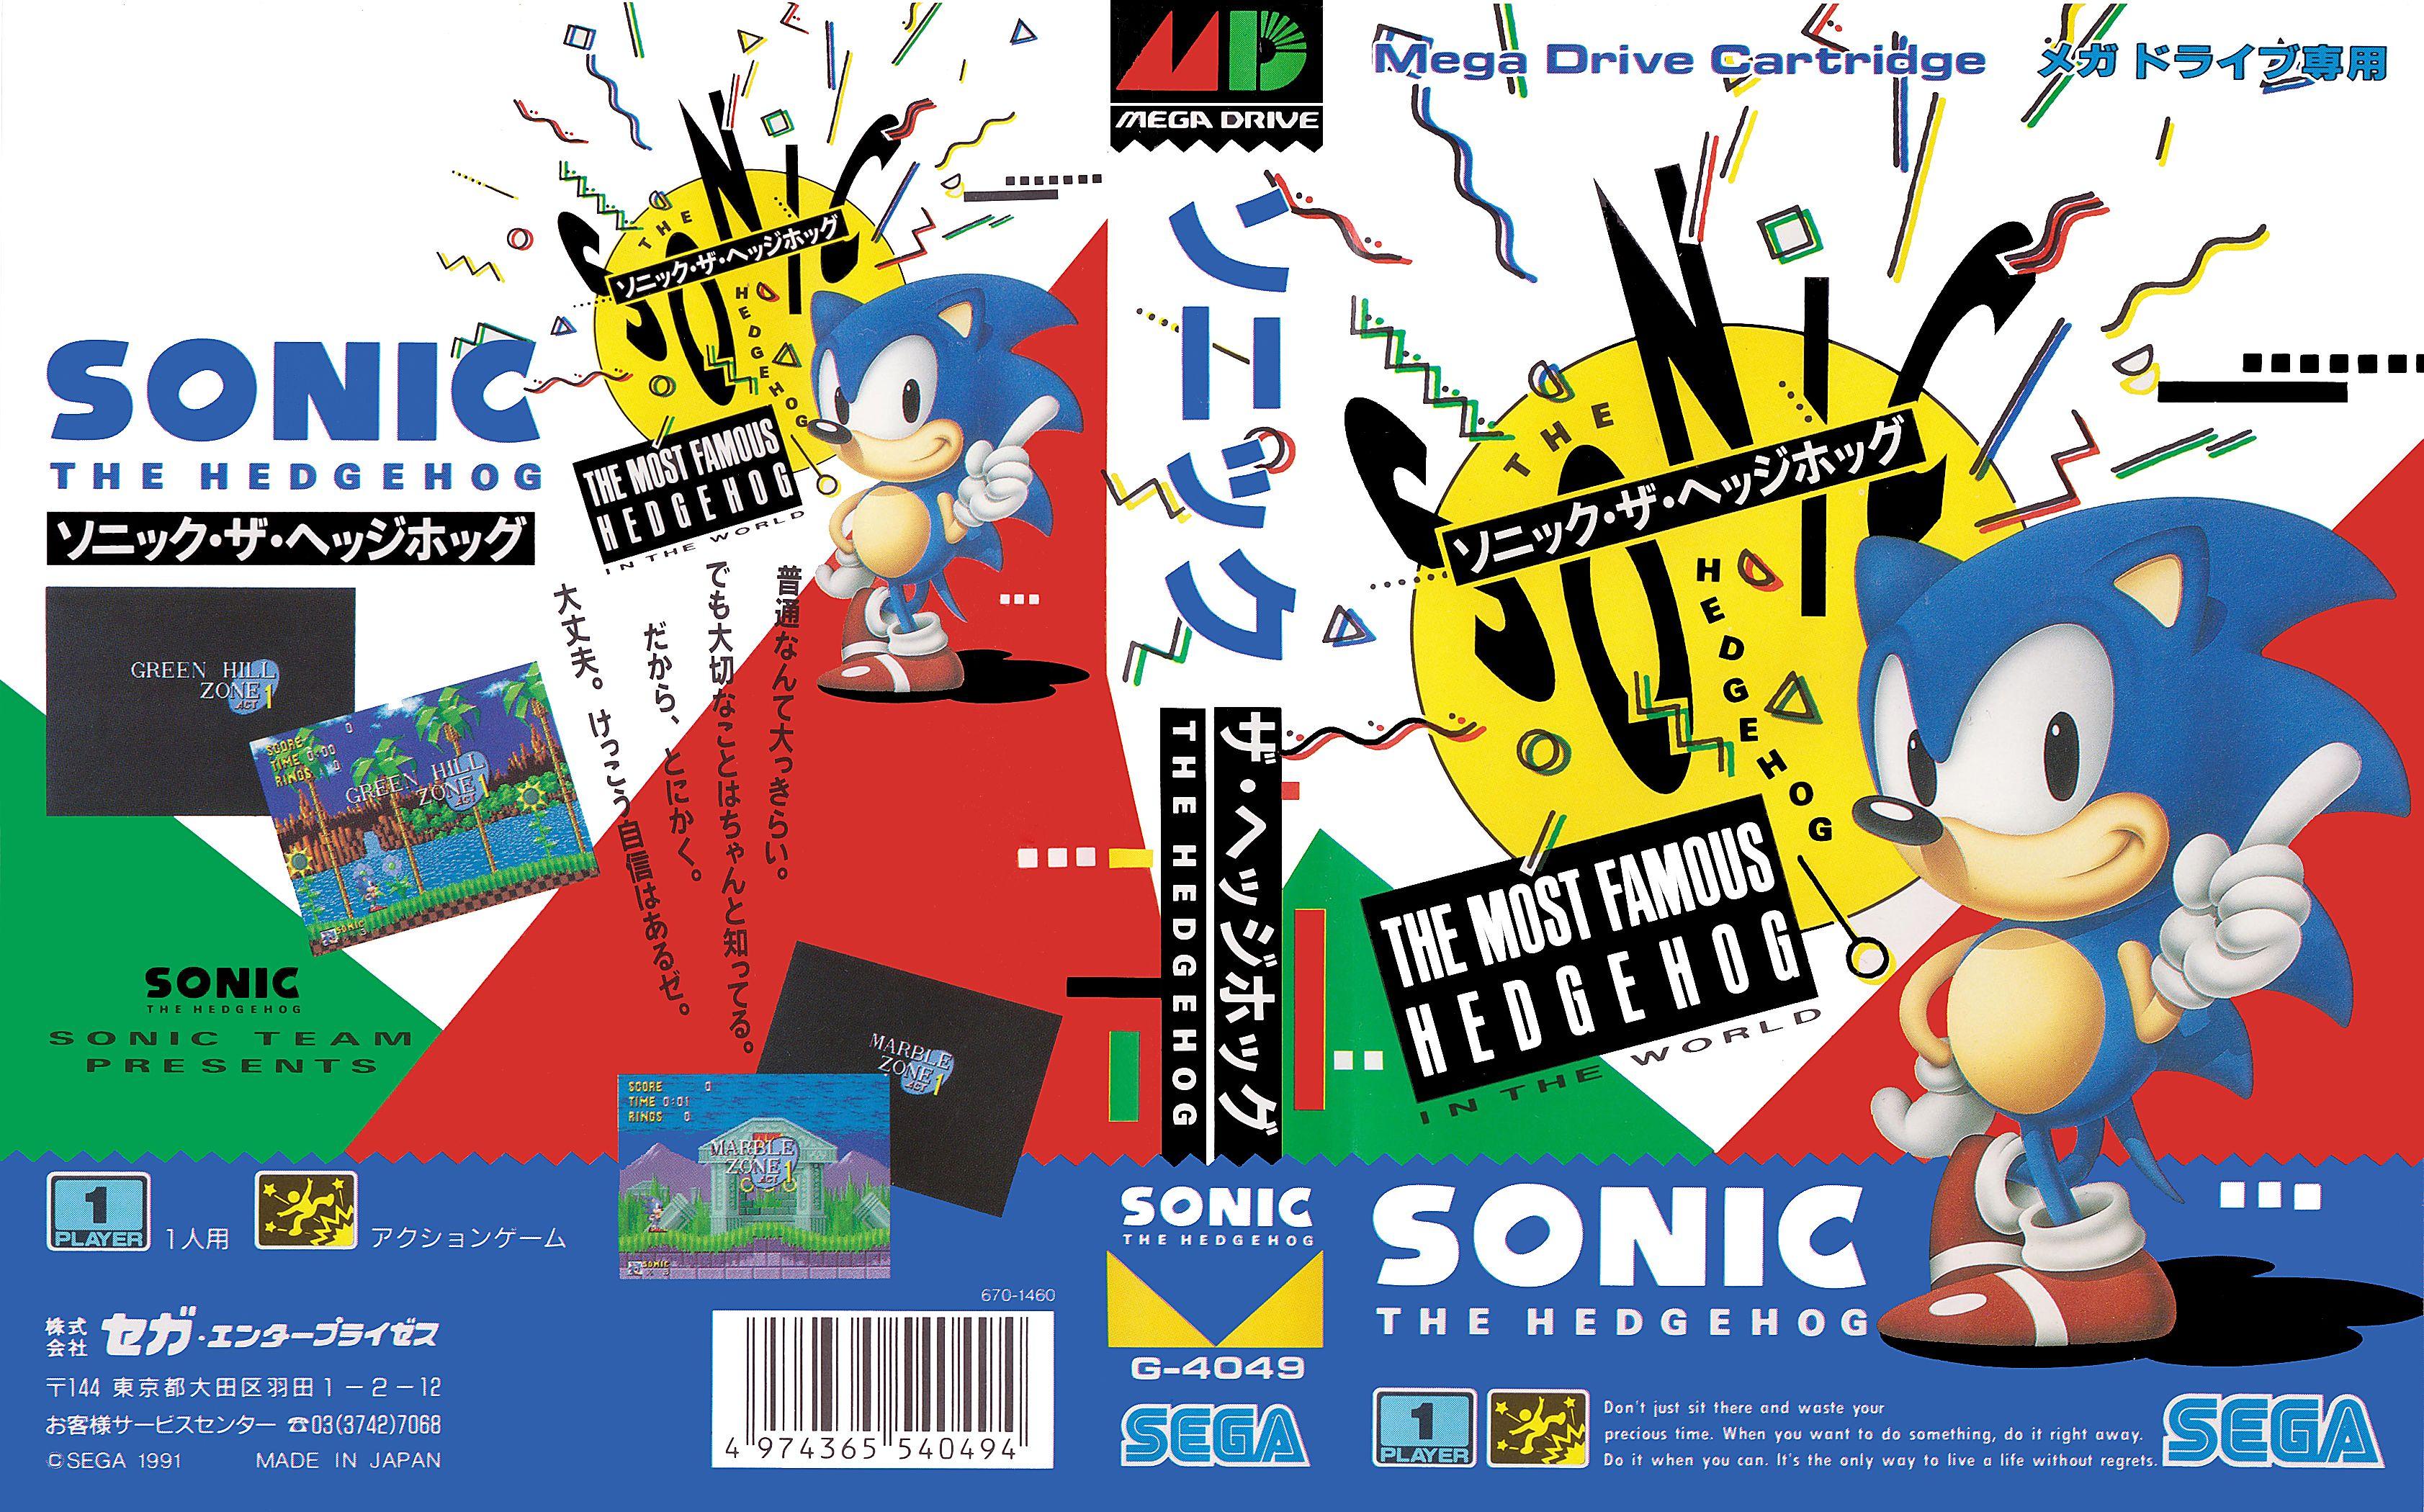 Pin By Svein Gunnar Johansen On Mega Drive Retro Video Games